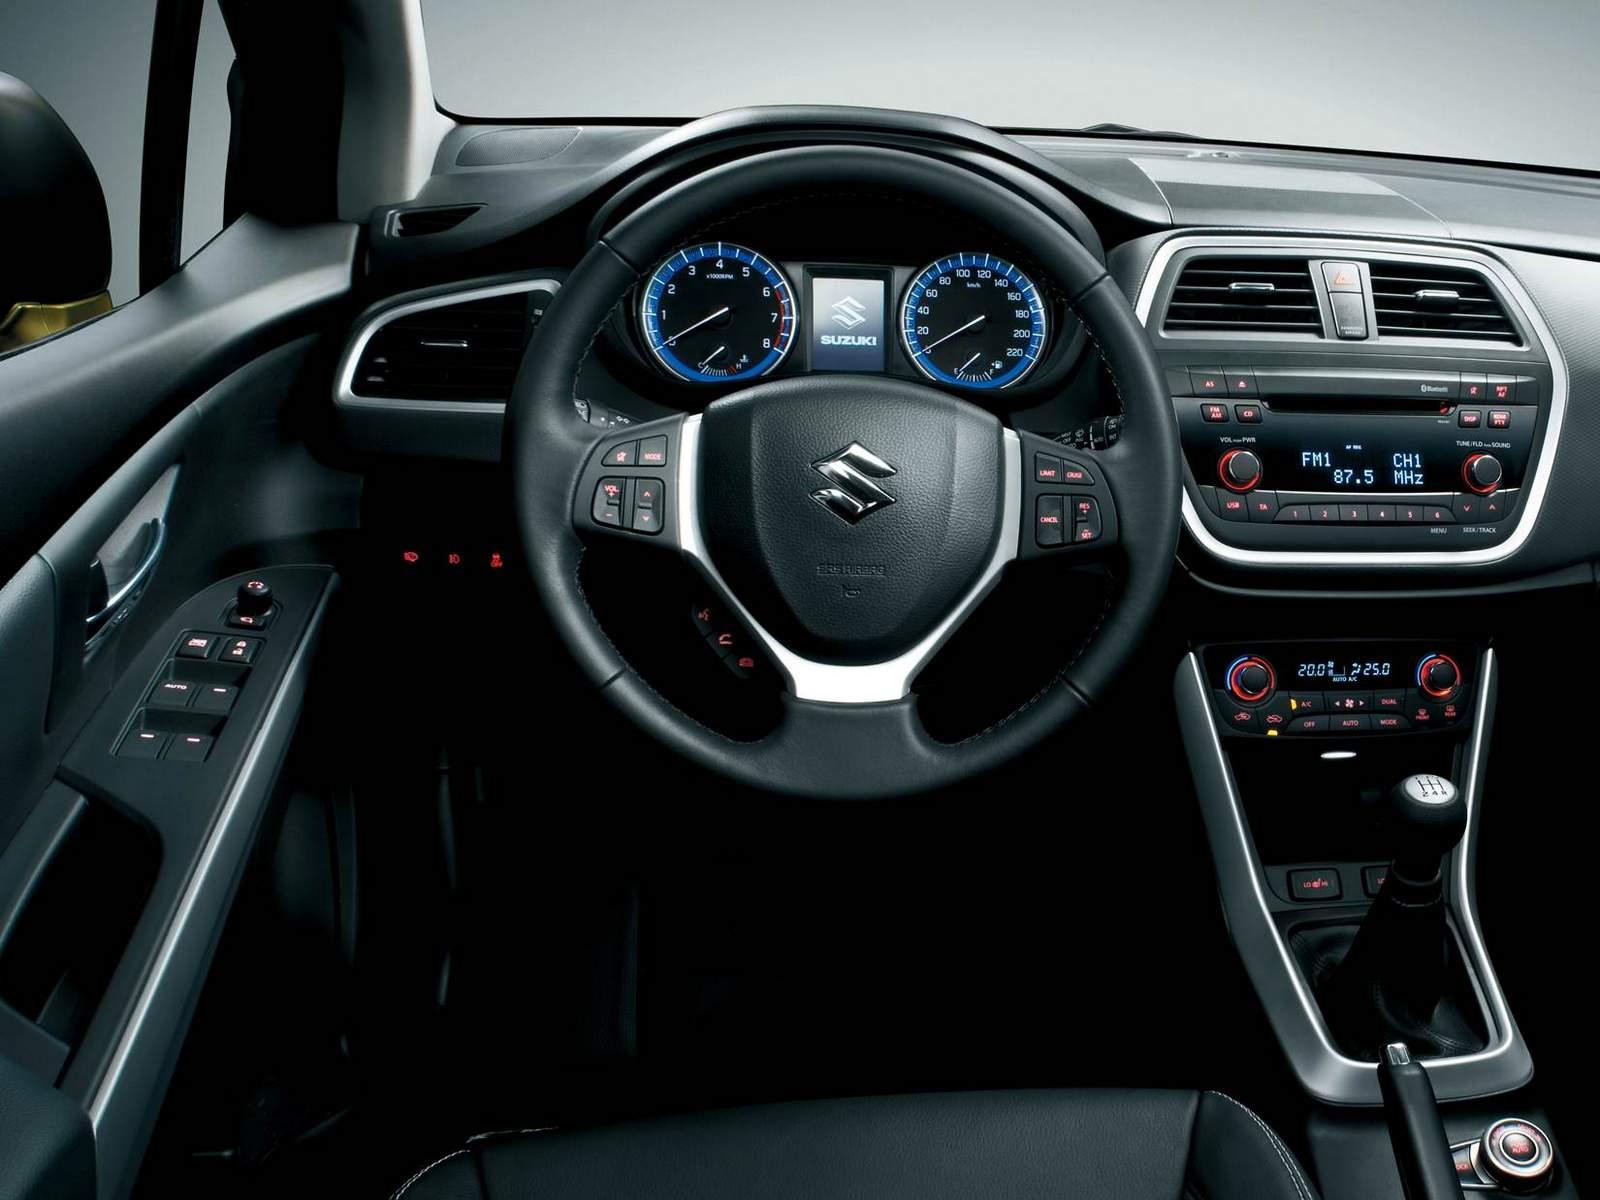 Suzuki S-Cross 2015 Brasil - interior - painel